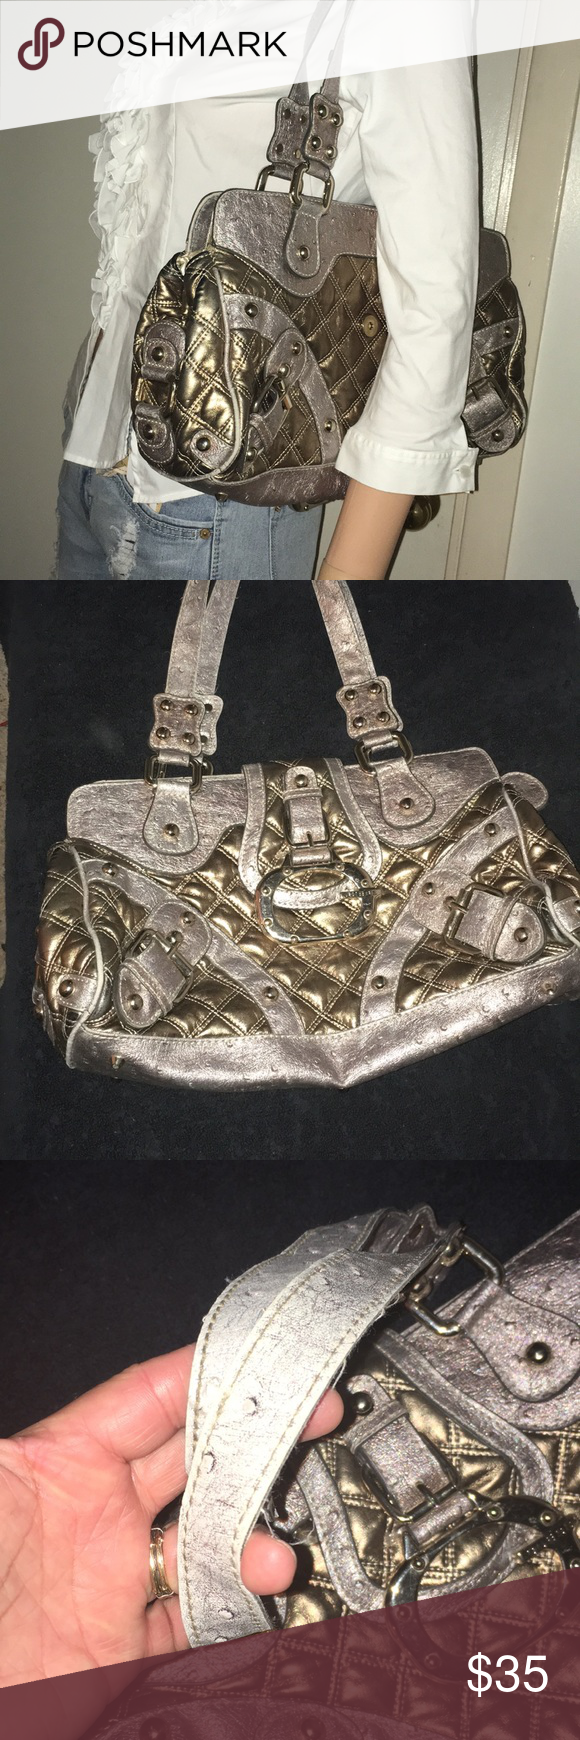 ec9b983762 Moonwalk Metallic Guess Handbag Pre owned great condition. No smells